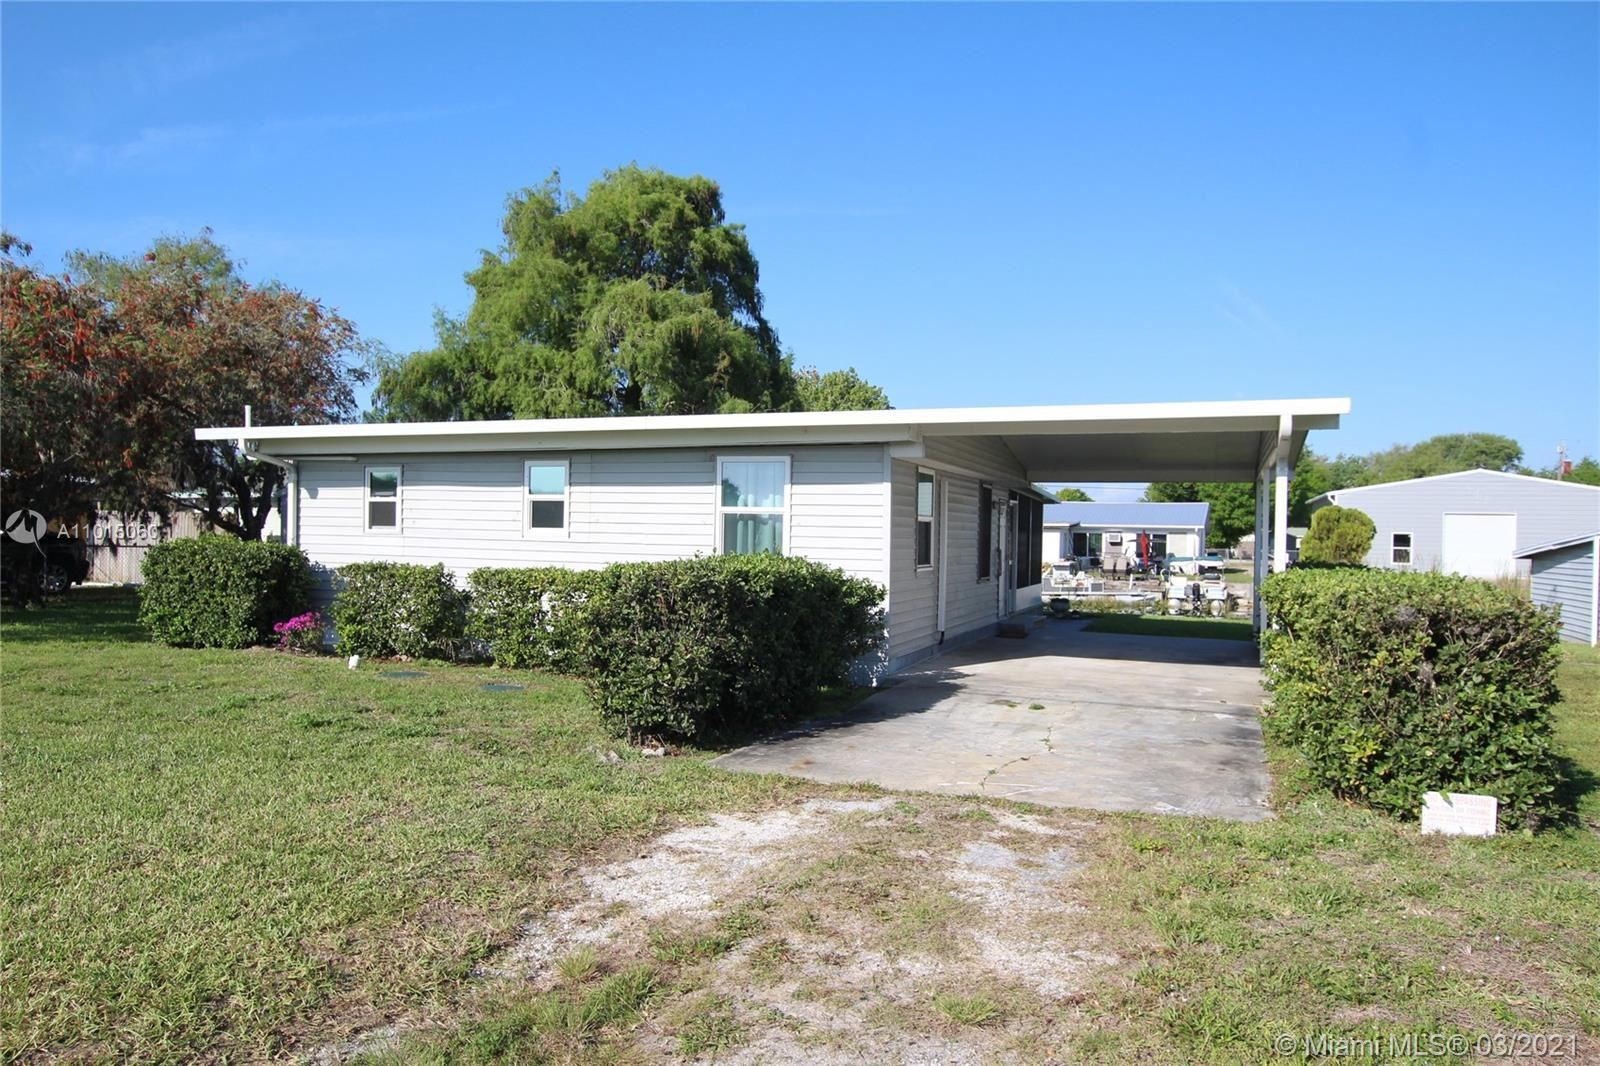 1480 Hunter Road, Okeechobee, FL 34974 - #: A11015060